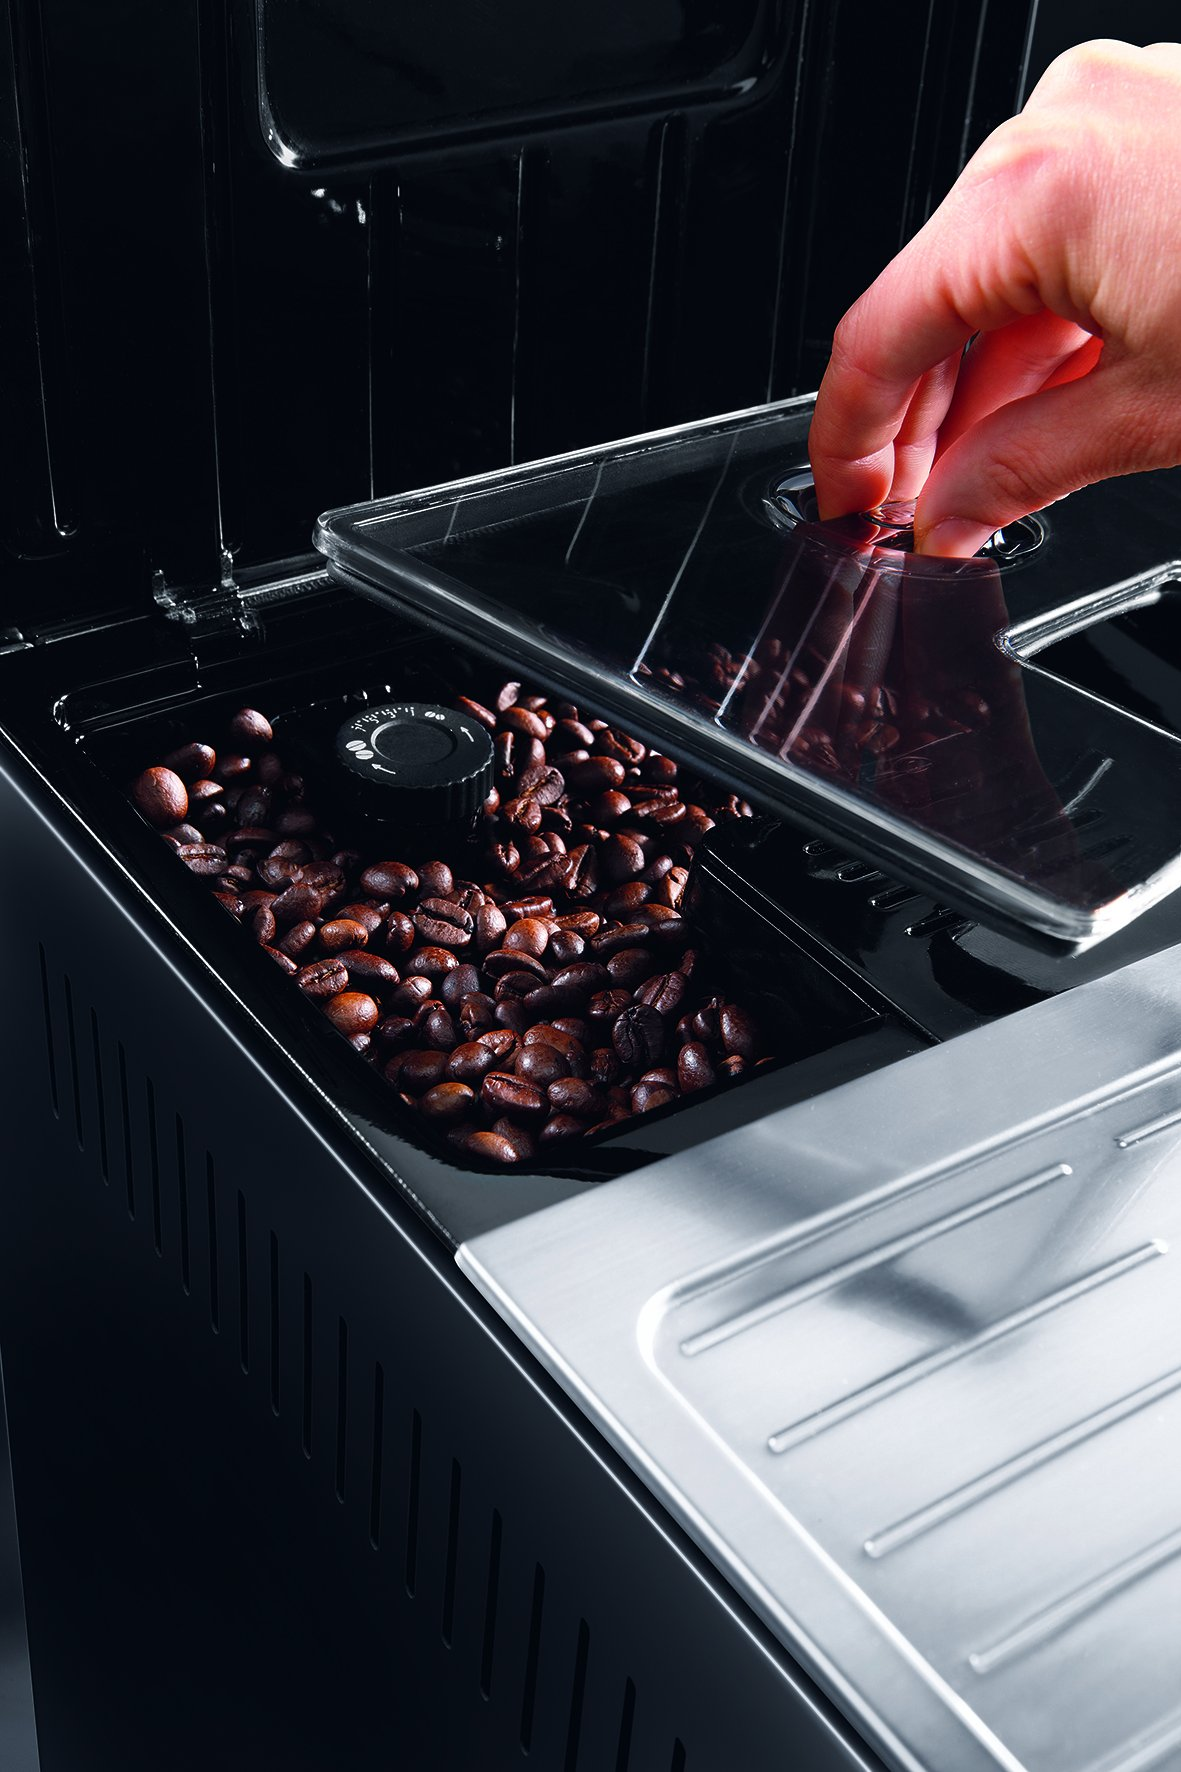 DeLonghi-PrimaDonna-S-ECAM-28466MB-Kaffeevollautomat-Digitaldisplay-integriertes-Milchsystem-Lieblingsgetrnke-auf-Knopfdruck-Edelstahlfront-2-Tassen-Funktion-Edelstahlfront-silber